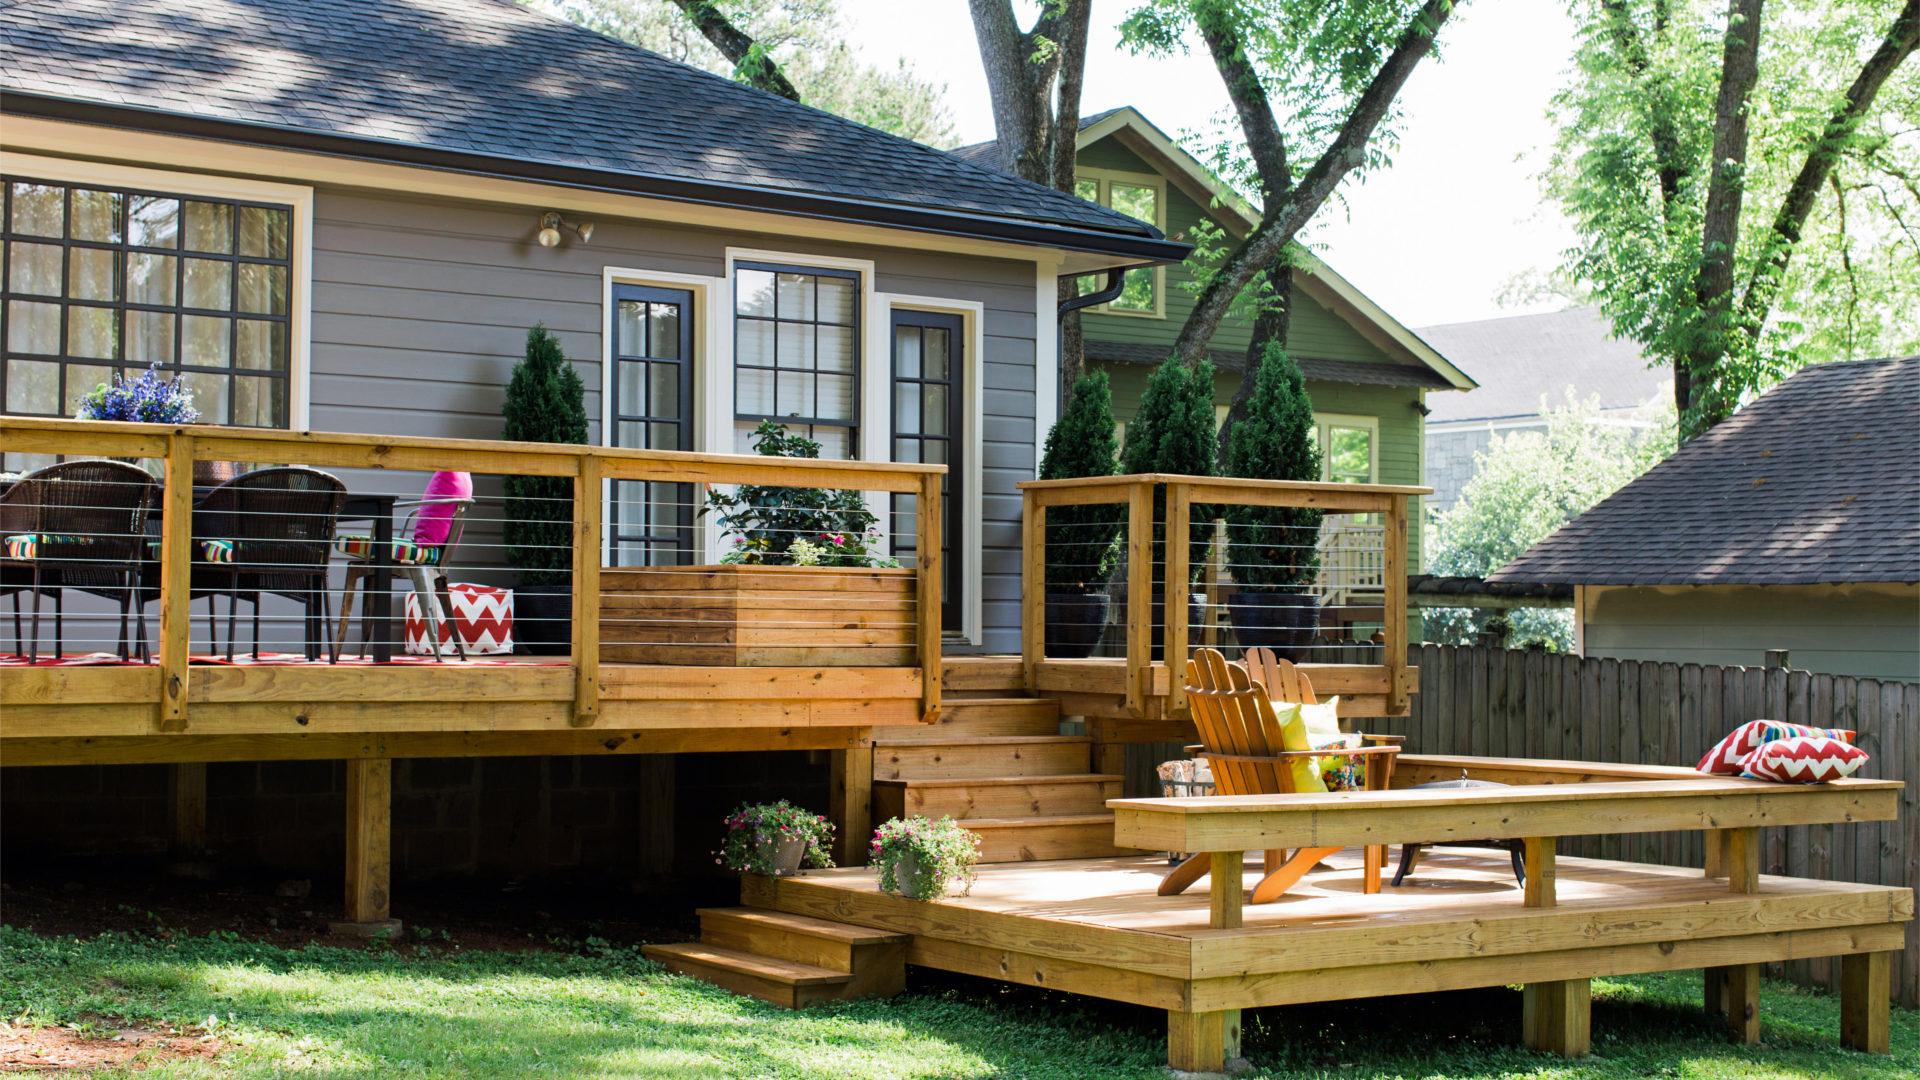 Composite-Decking-Ideas Railing Designs Colonial Homes on colonial porch designs, colonial stair designs, colonial fence designs, colonial deck designs,